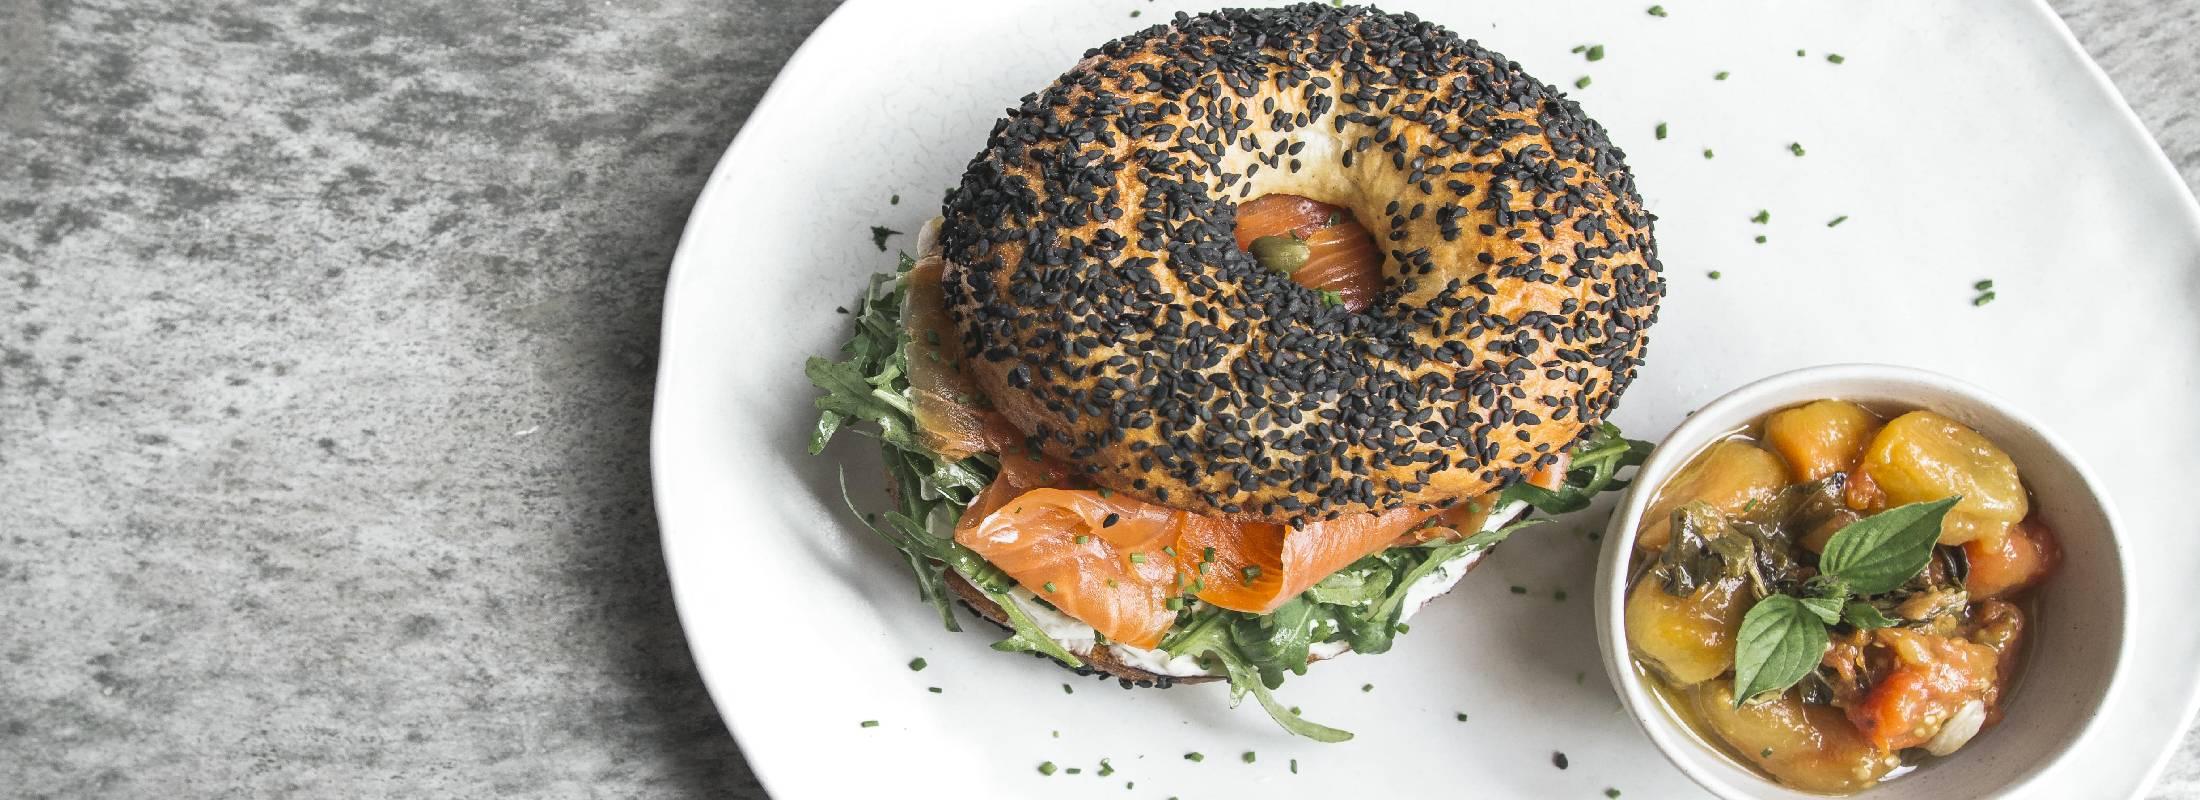 comida saludable en retiro de bali